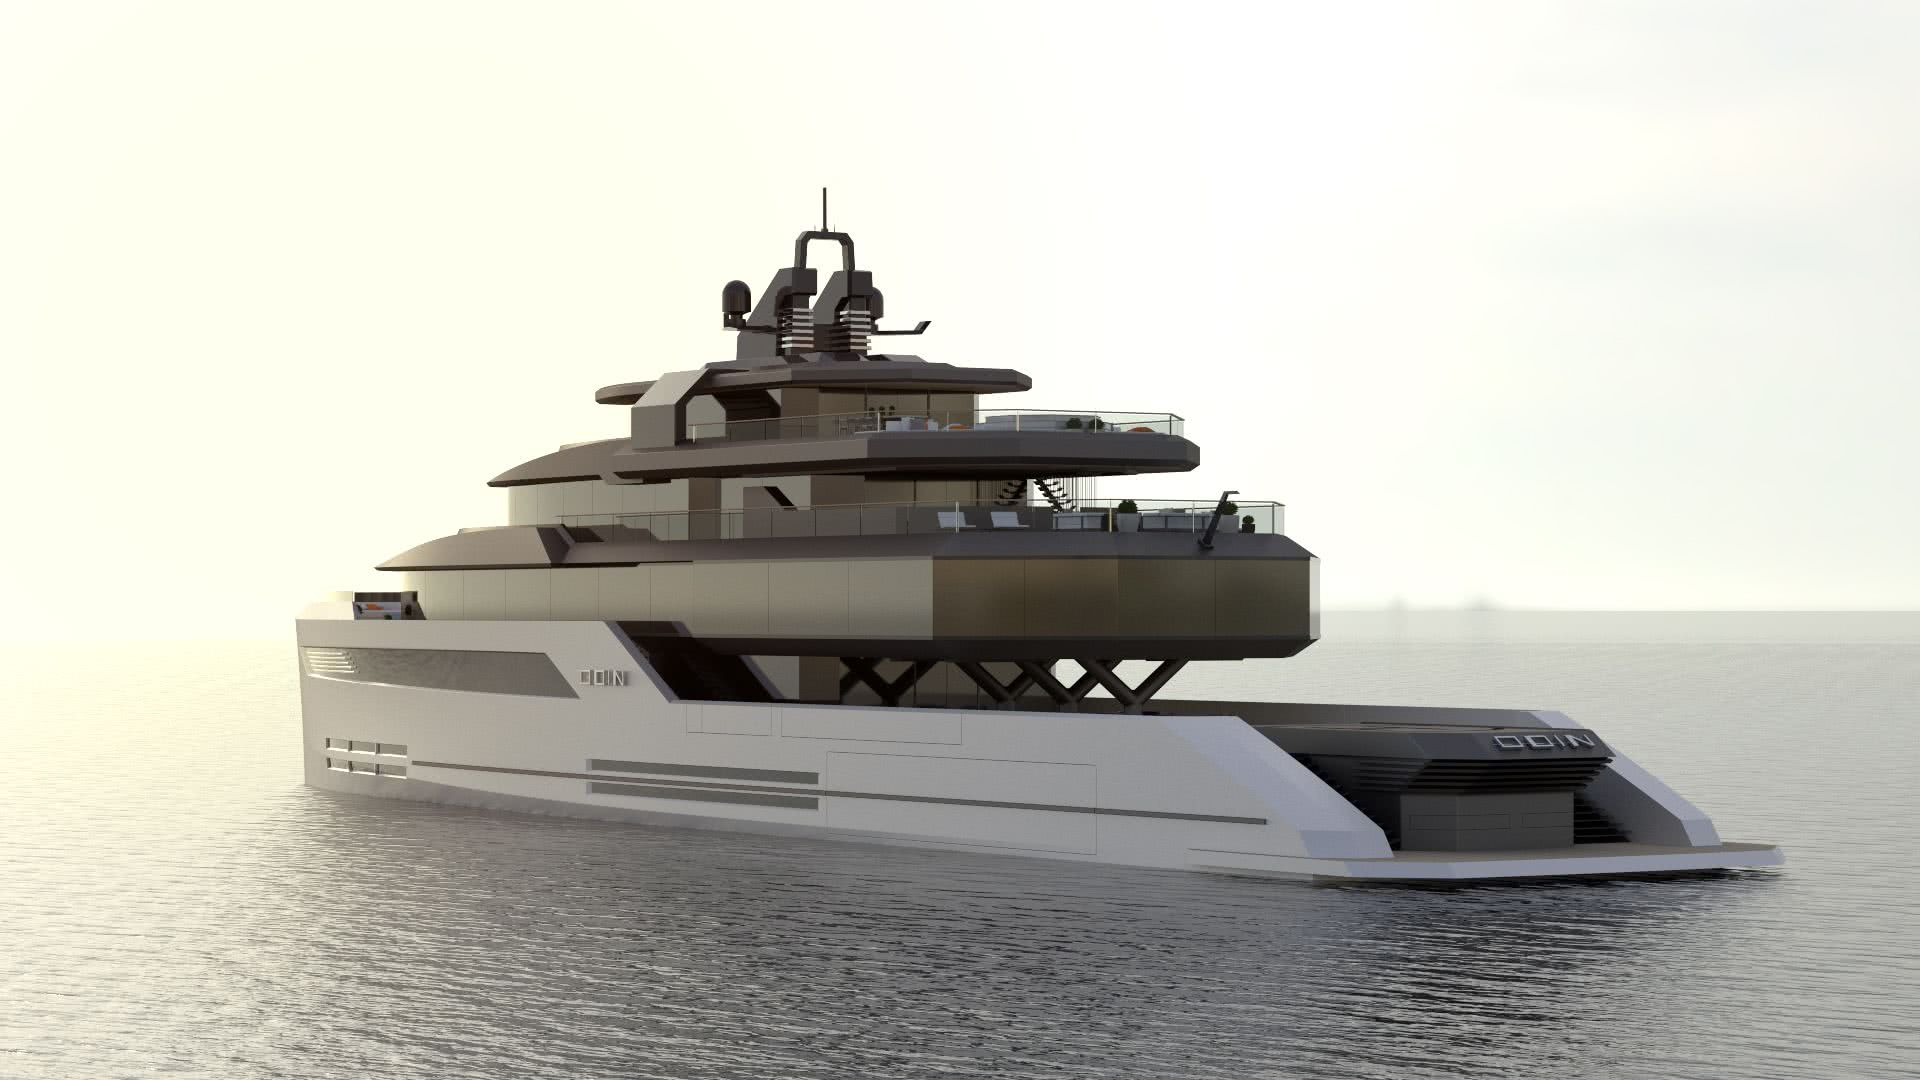 Odin Yacht Joe Ricketts